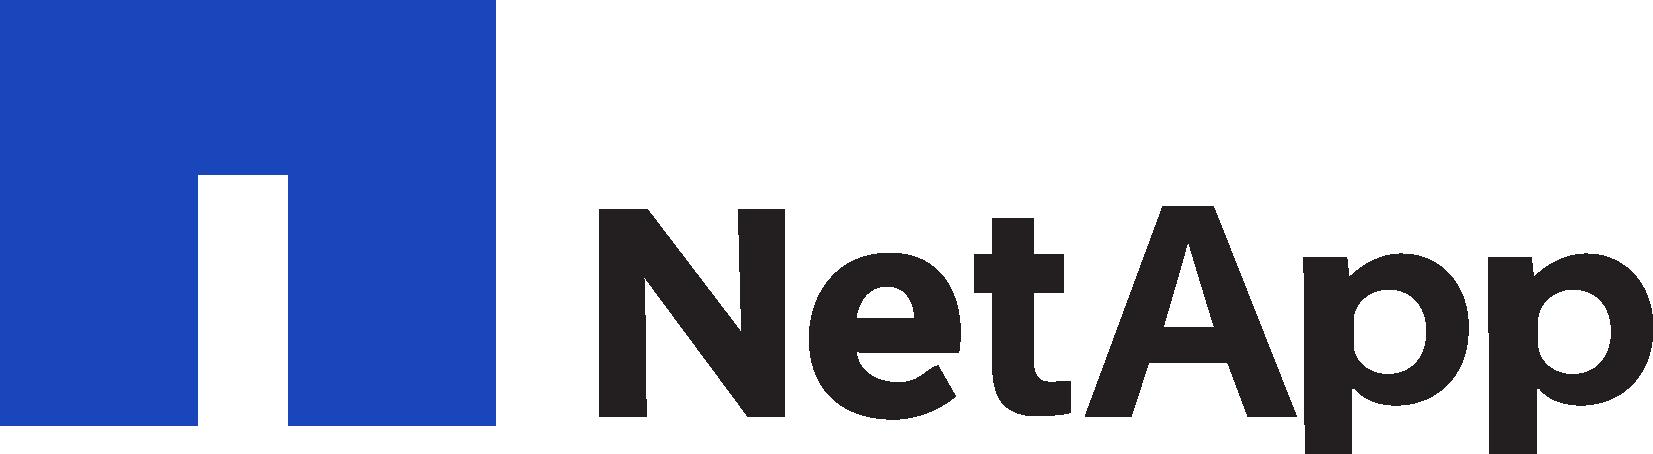 netapp logog